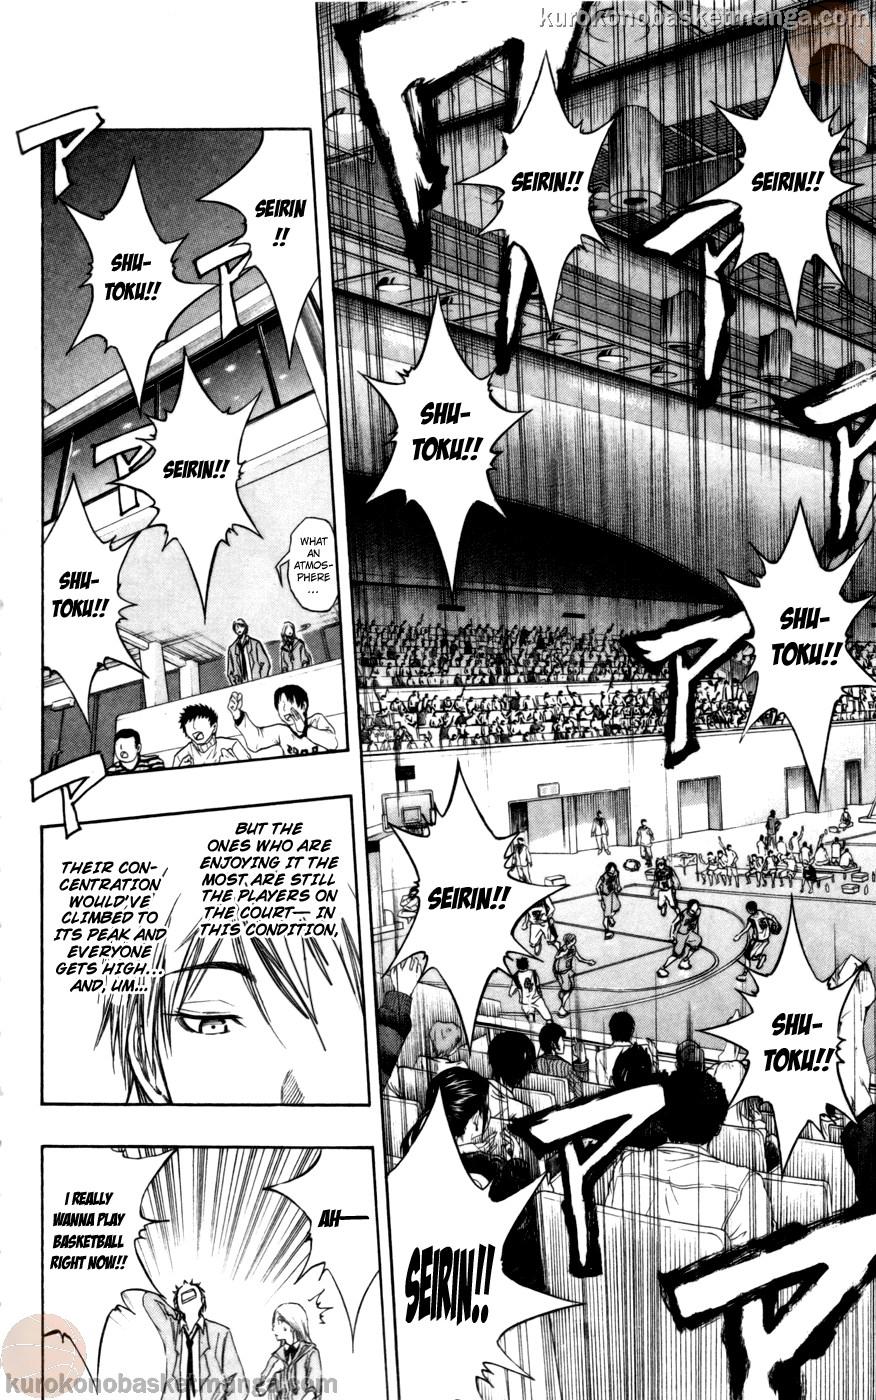 Kuroko no Basket Manga Chapter 91 - Image 14